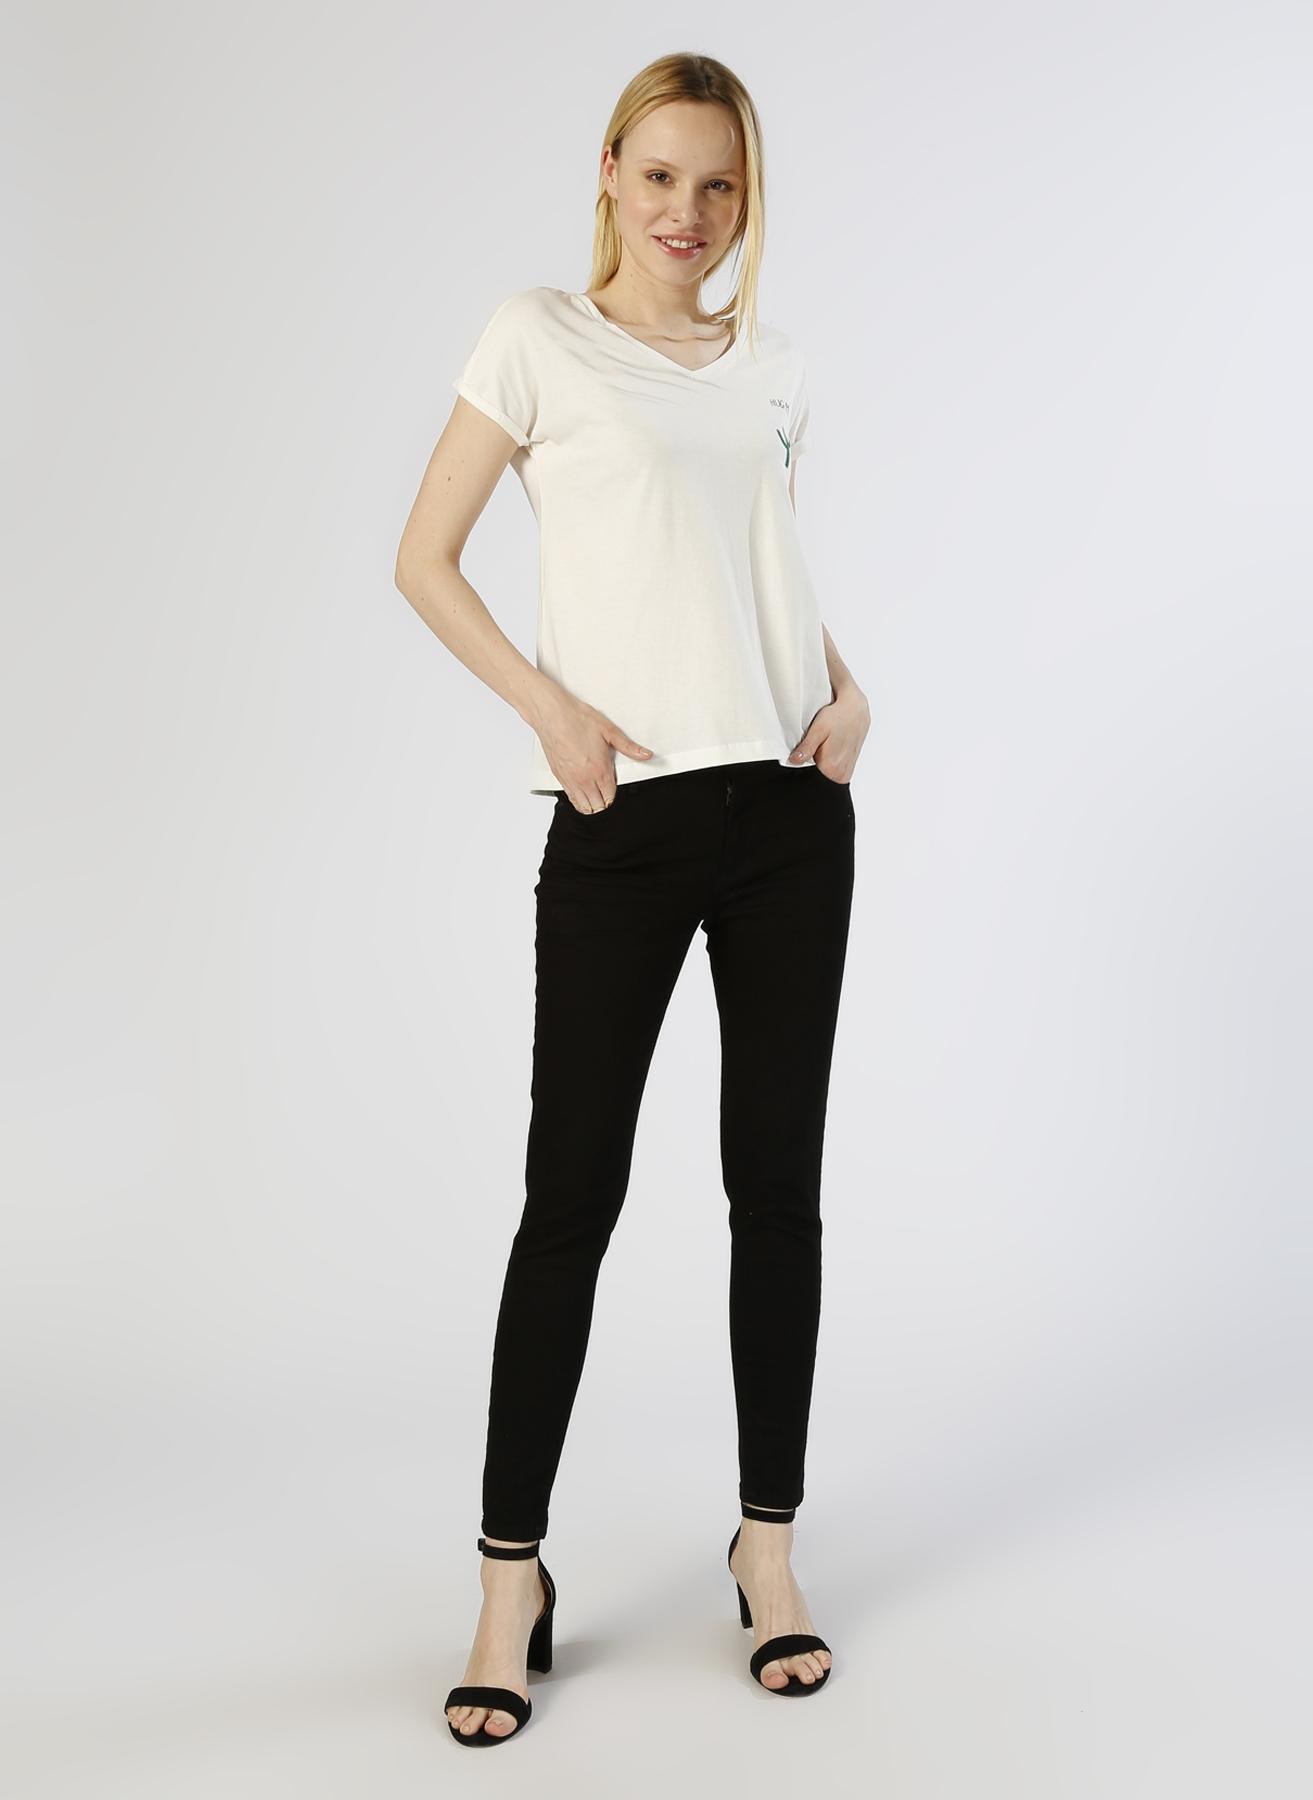 Loft Skinny Siyah Denim Pantolon 29-27 5000225260008 Ürün Resmi